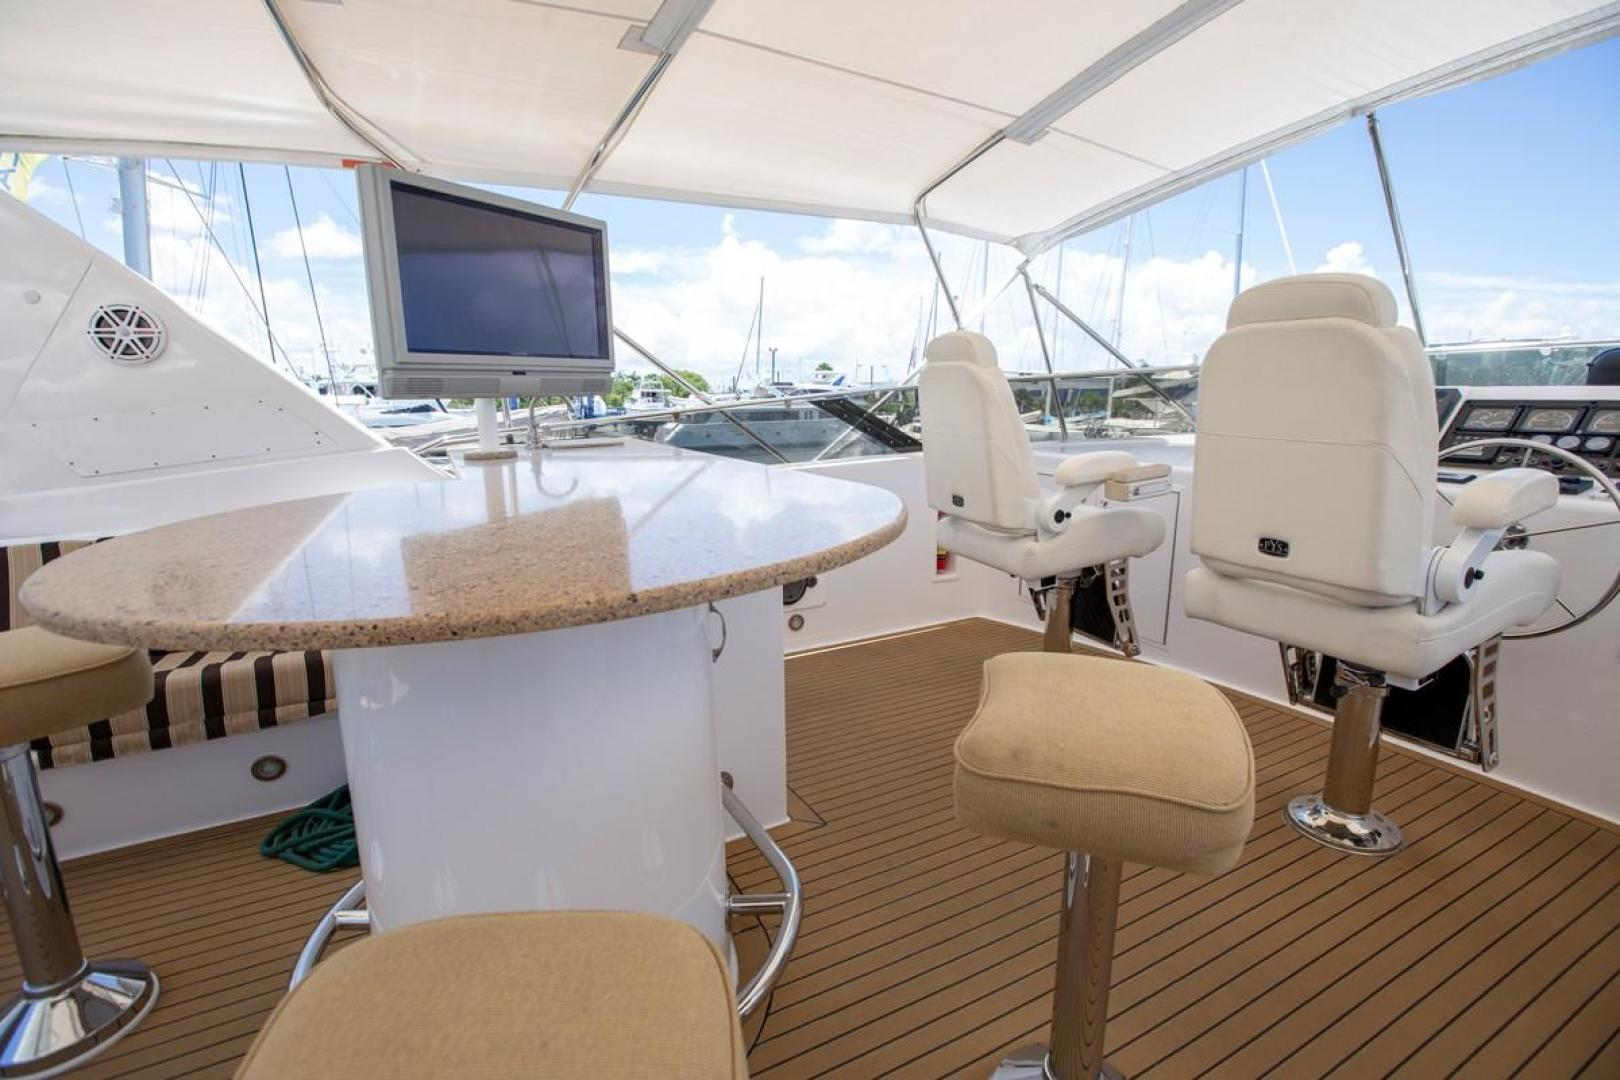 Hatteras-Cockpit Motor Yacht 2000-Getaway Ft. Lauderdale-Florida-United States-977394 | Thumbnail